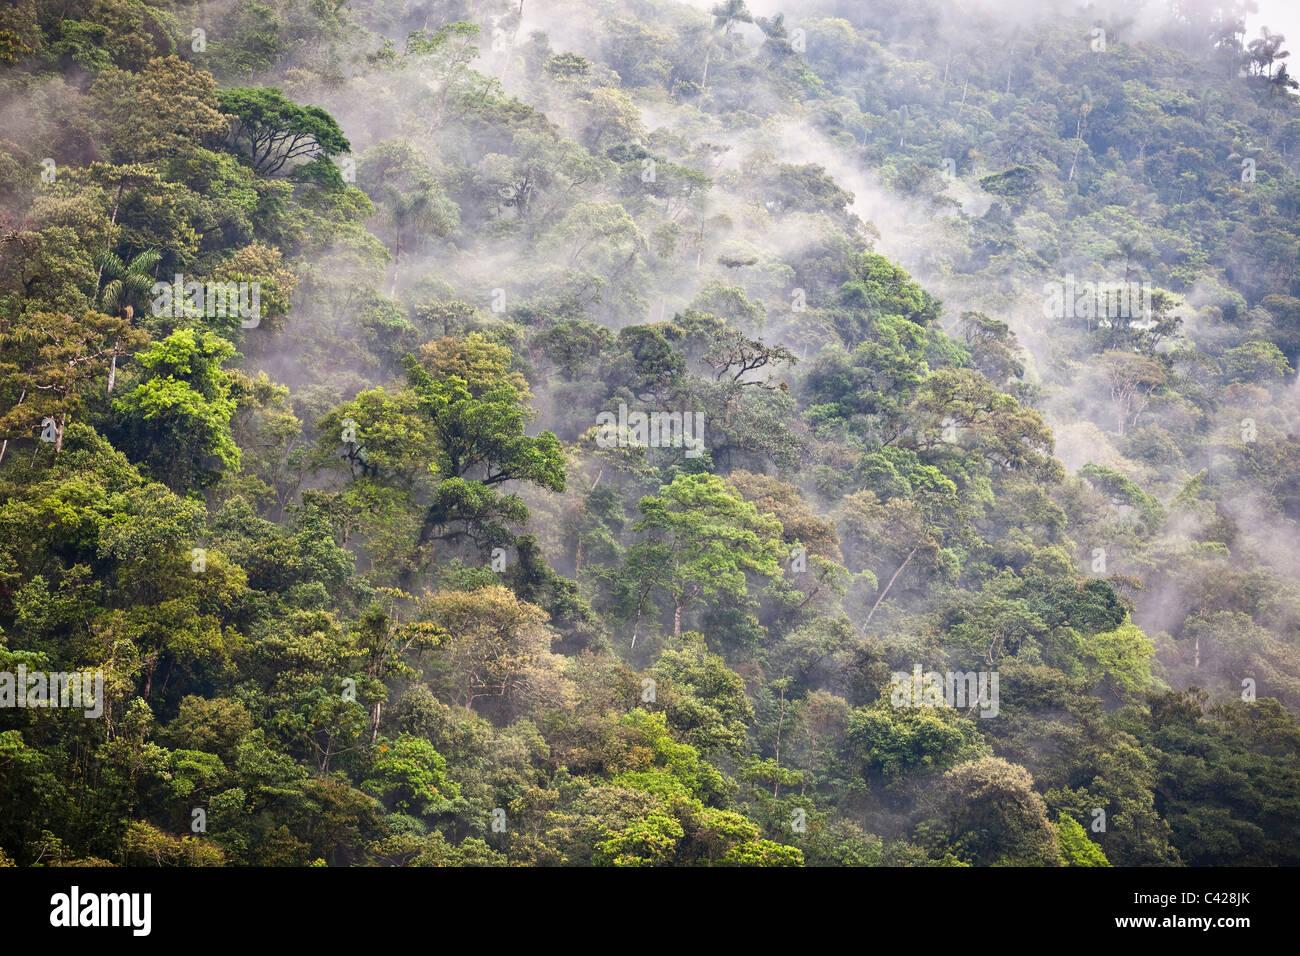 Peru, San Pedro, Manu National Park, Cloud forest. UNESCO World Heritage Site. - Stock Image